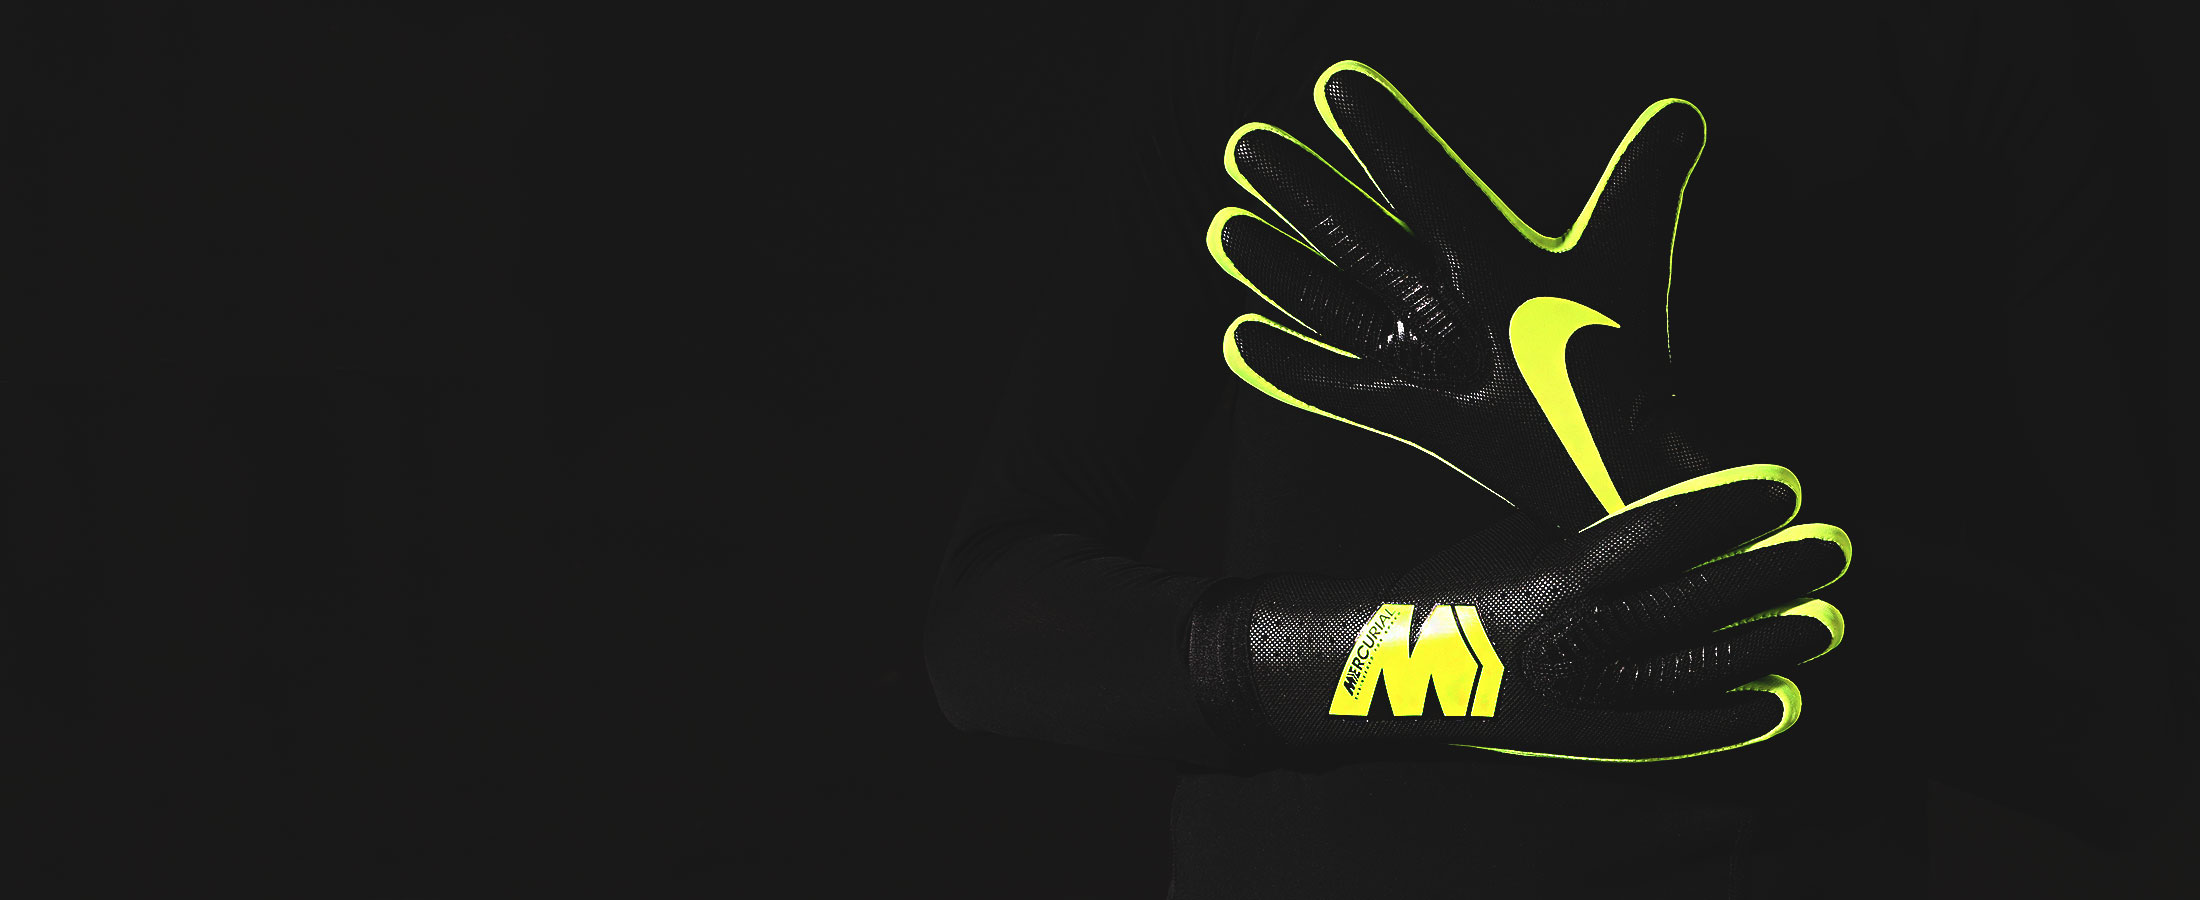 Nuevos guantes de portero Nike Mercurial Touch Elite